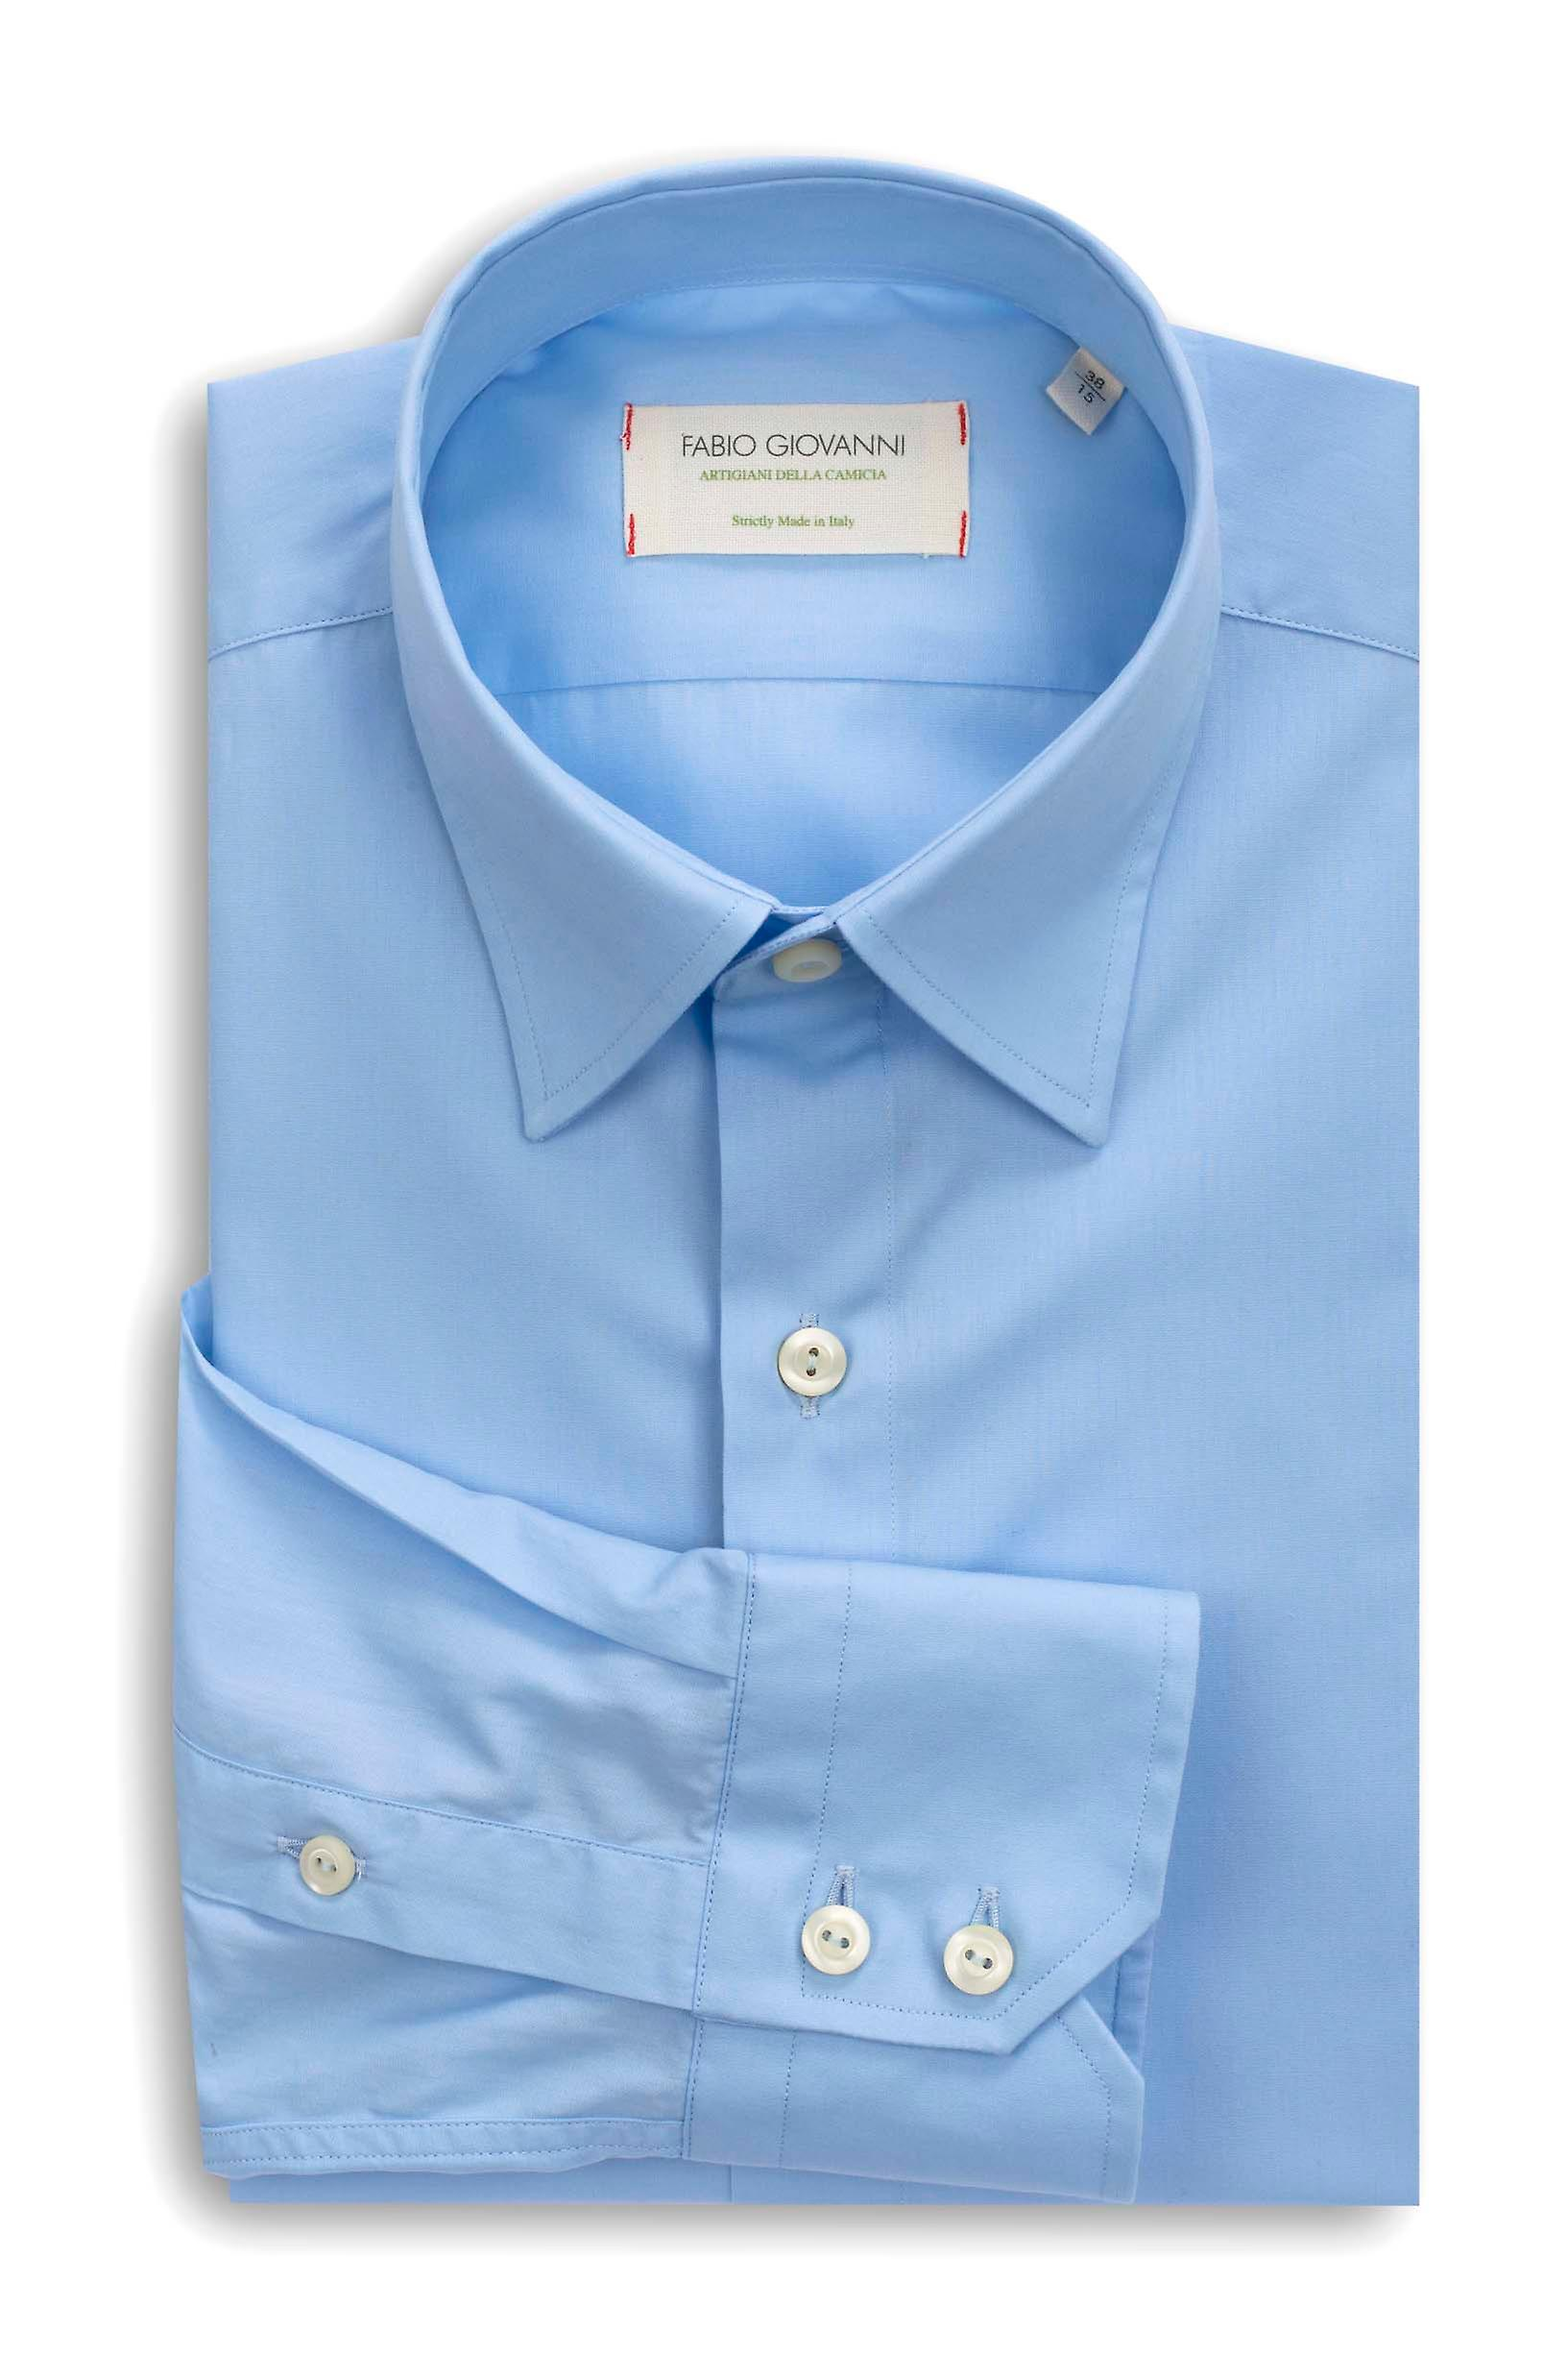 Fabio Giovanni Salina Shirt - Italian Stretch Cotton with Soft Collar - Plain Blue Shirt